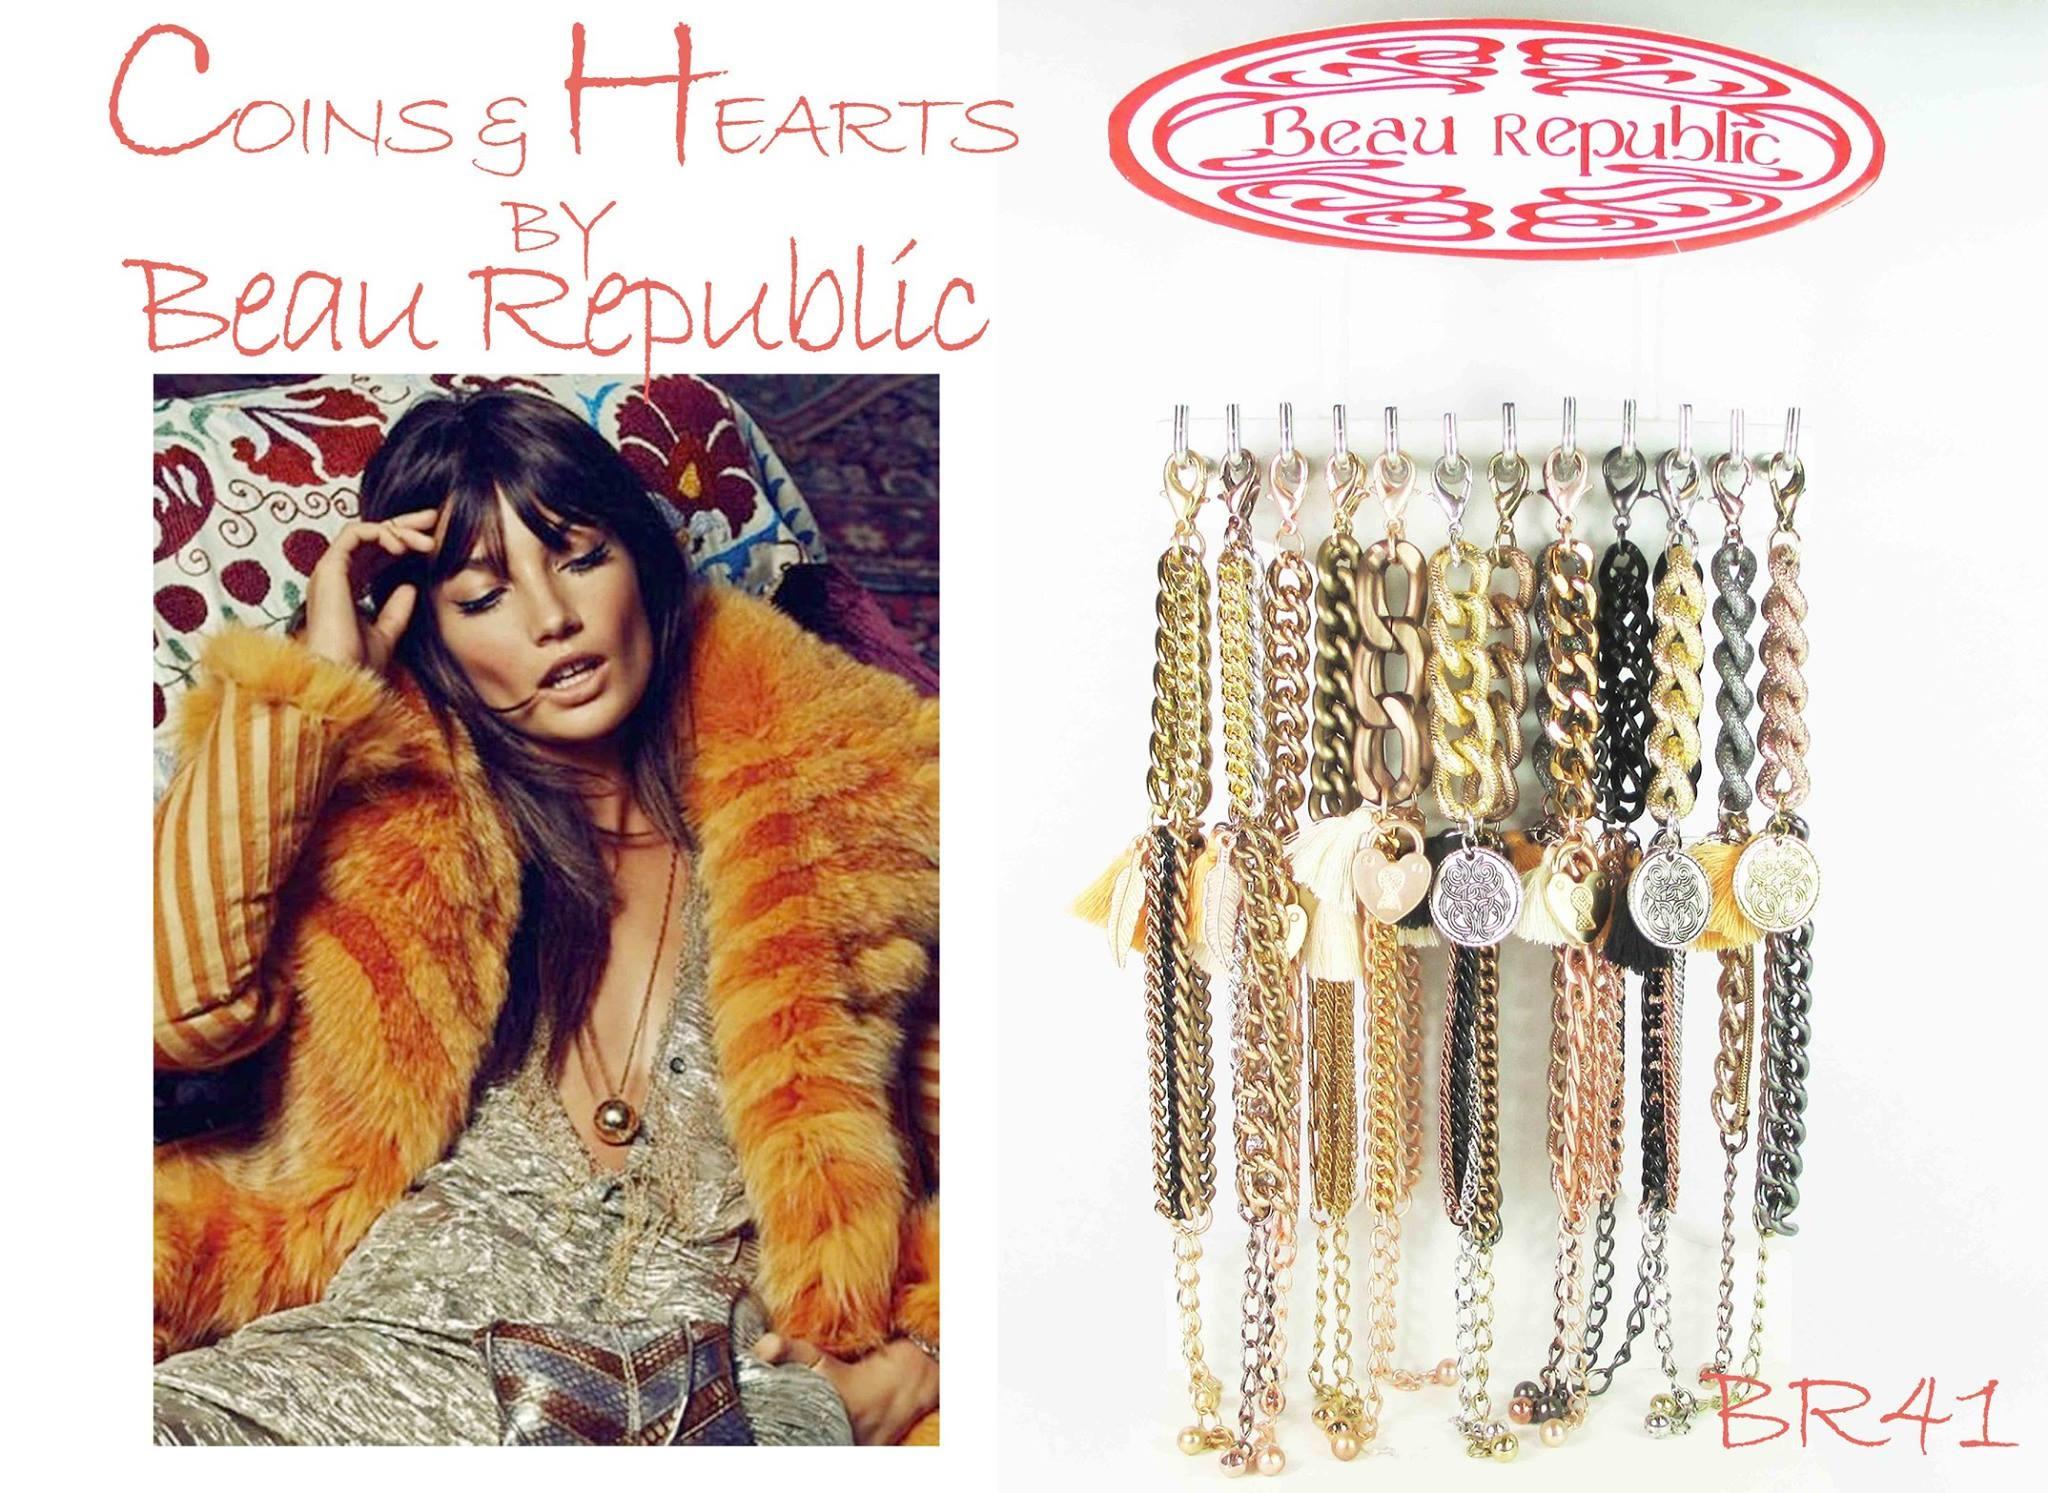 Beau Republic Armband Coins & Hearts by Beau Republic  No8